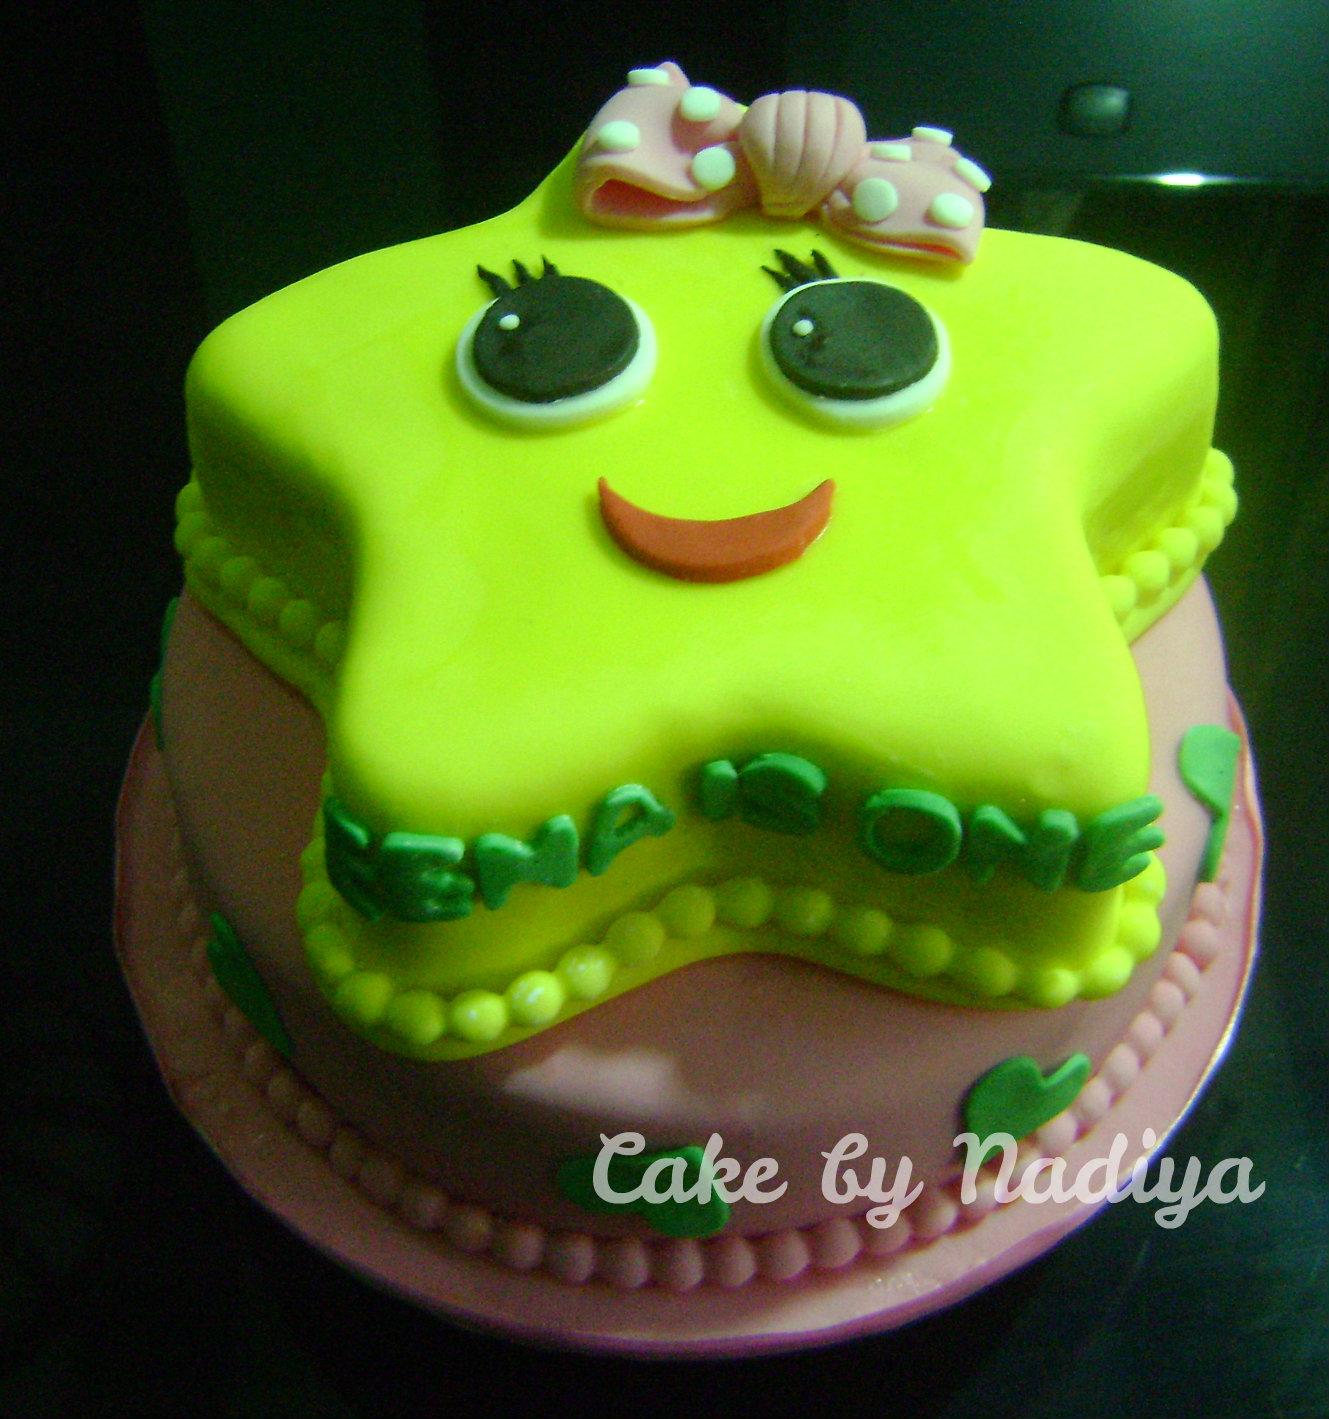 Cake Baking Classes Reading